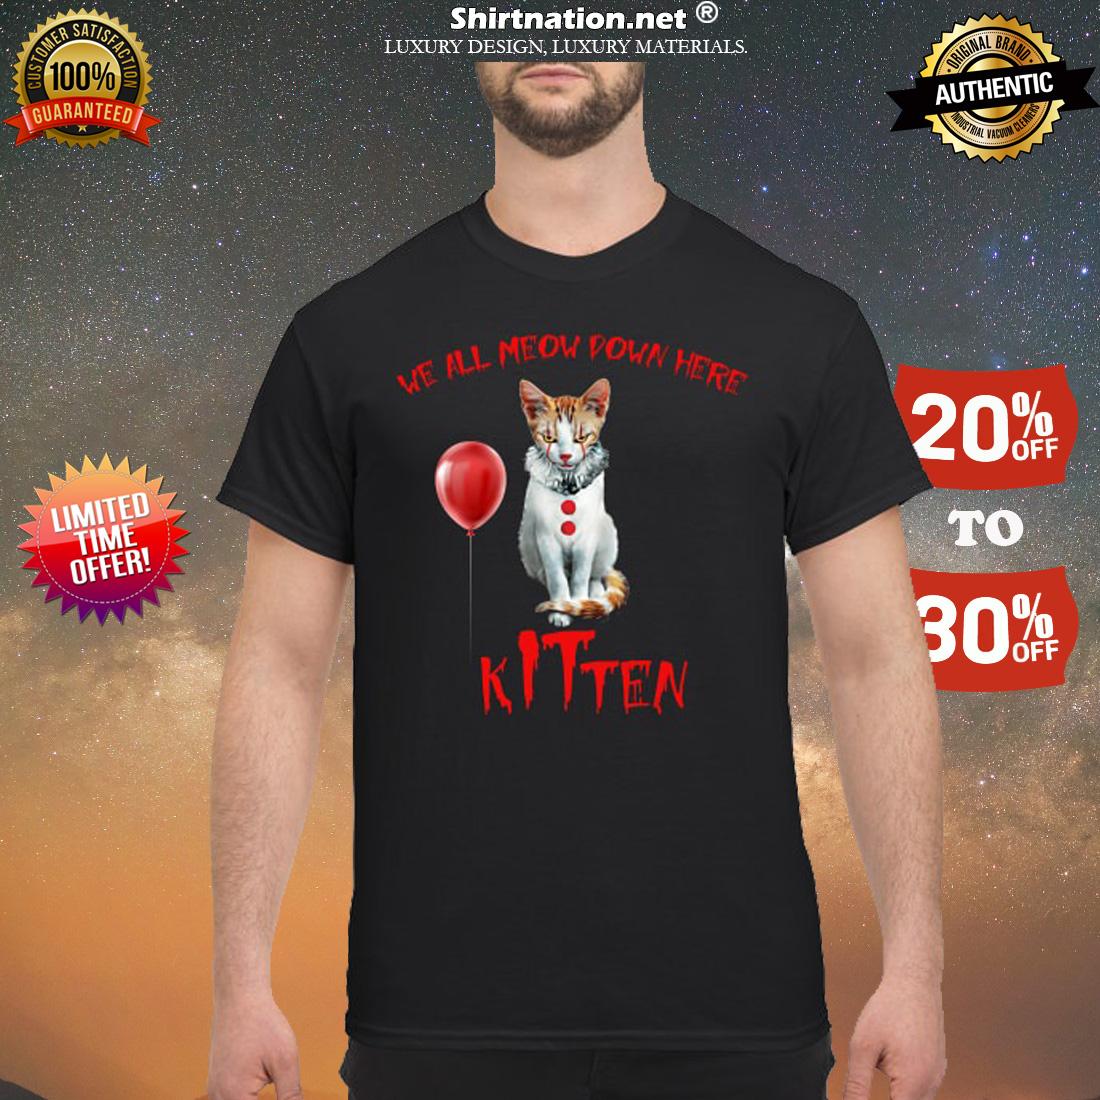 We all meow down here kitten classic shirt